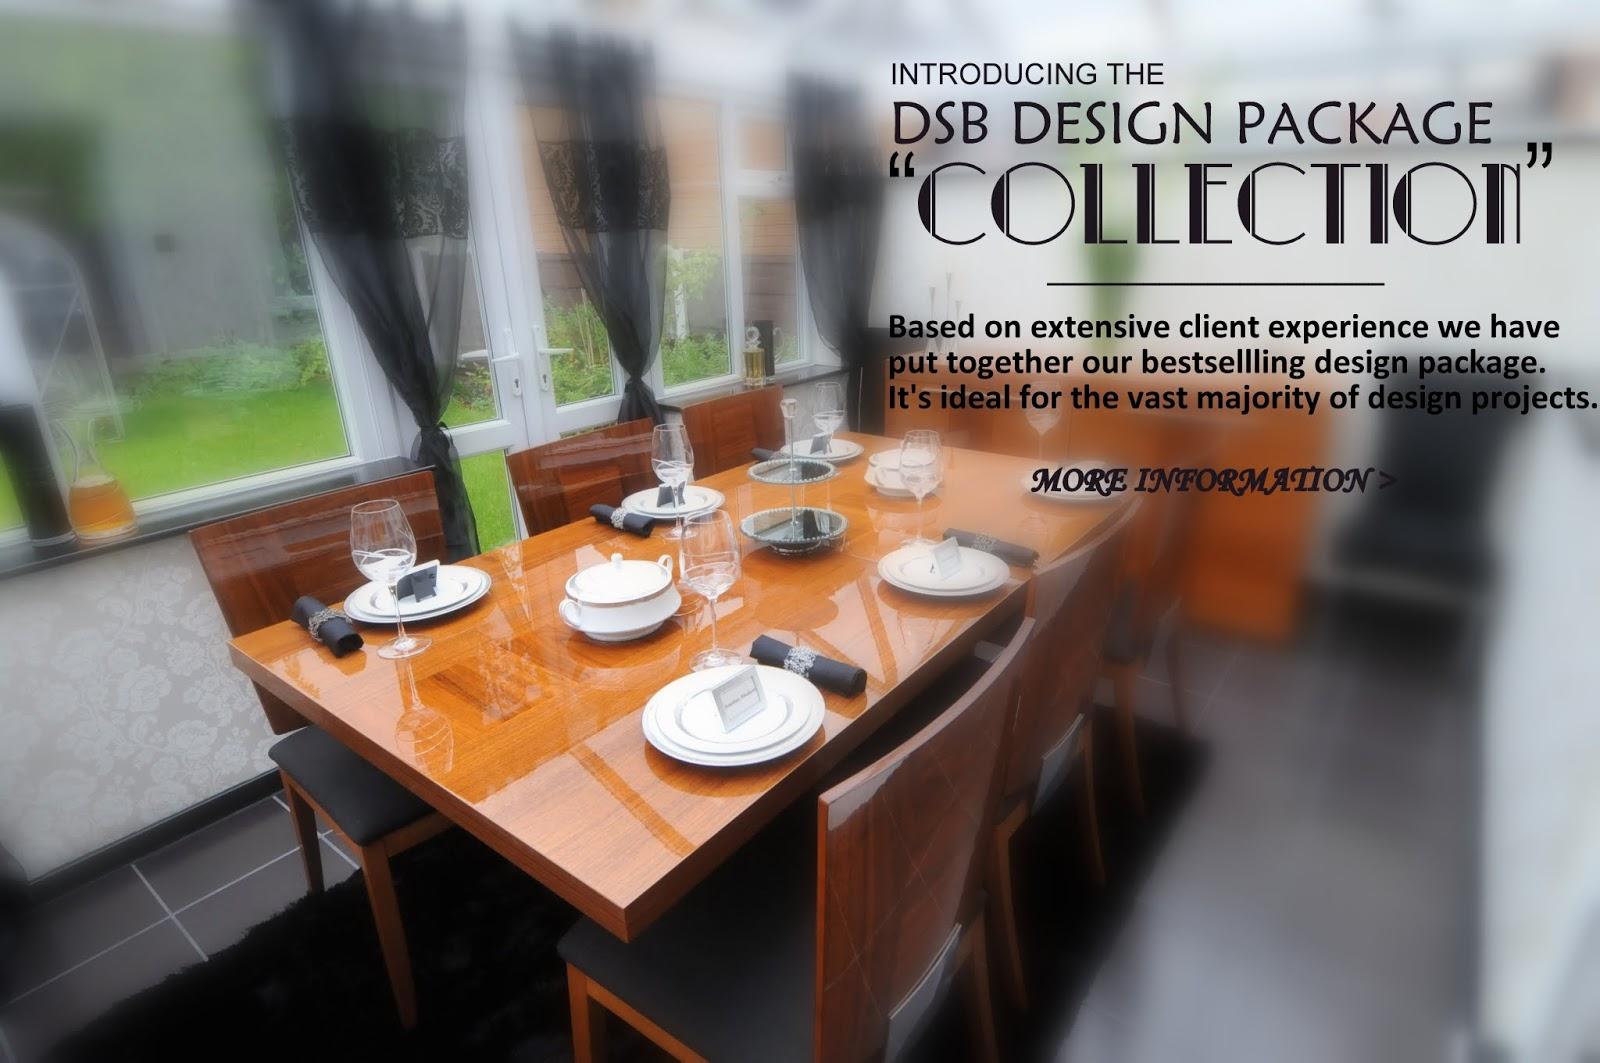 DSB's Bestselling Design Package